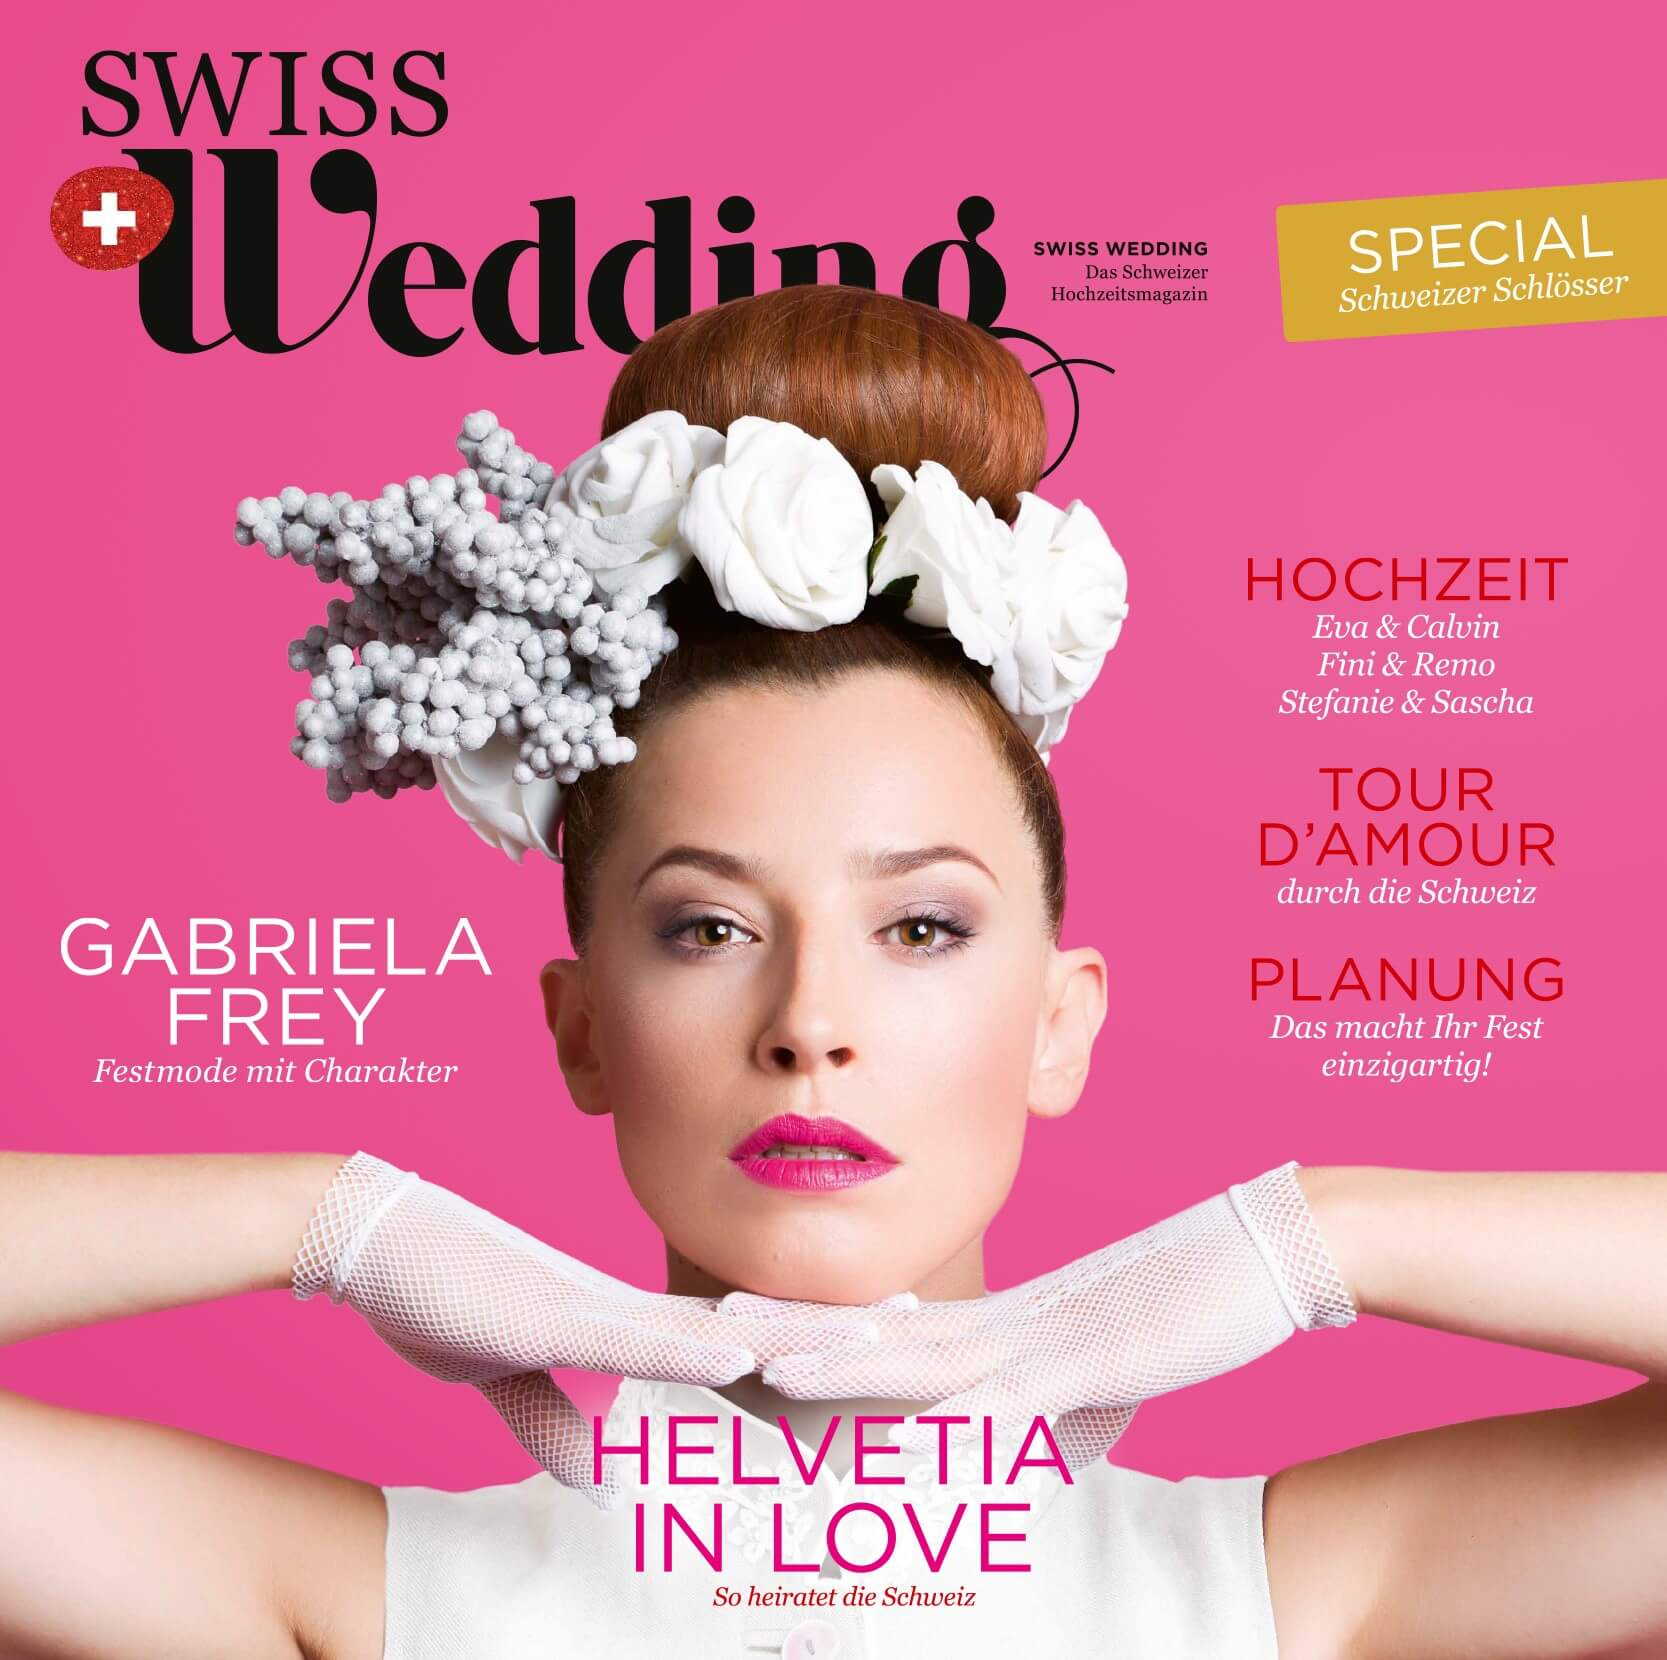 https://www.haar-werk.ch/wp-content/uploads/2021/04/swiss-wedding.jpg